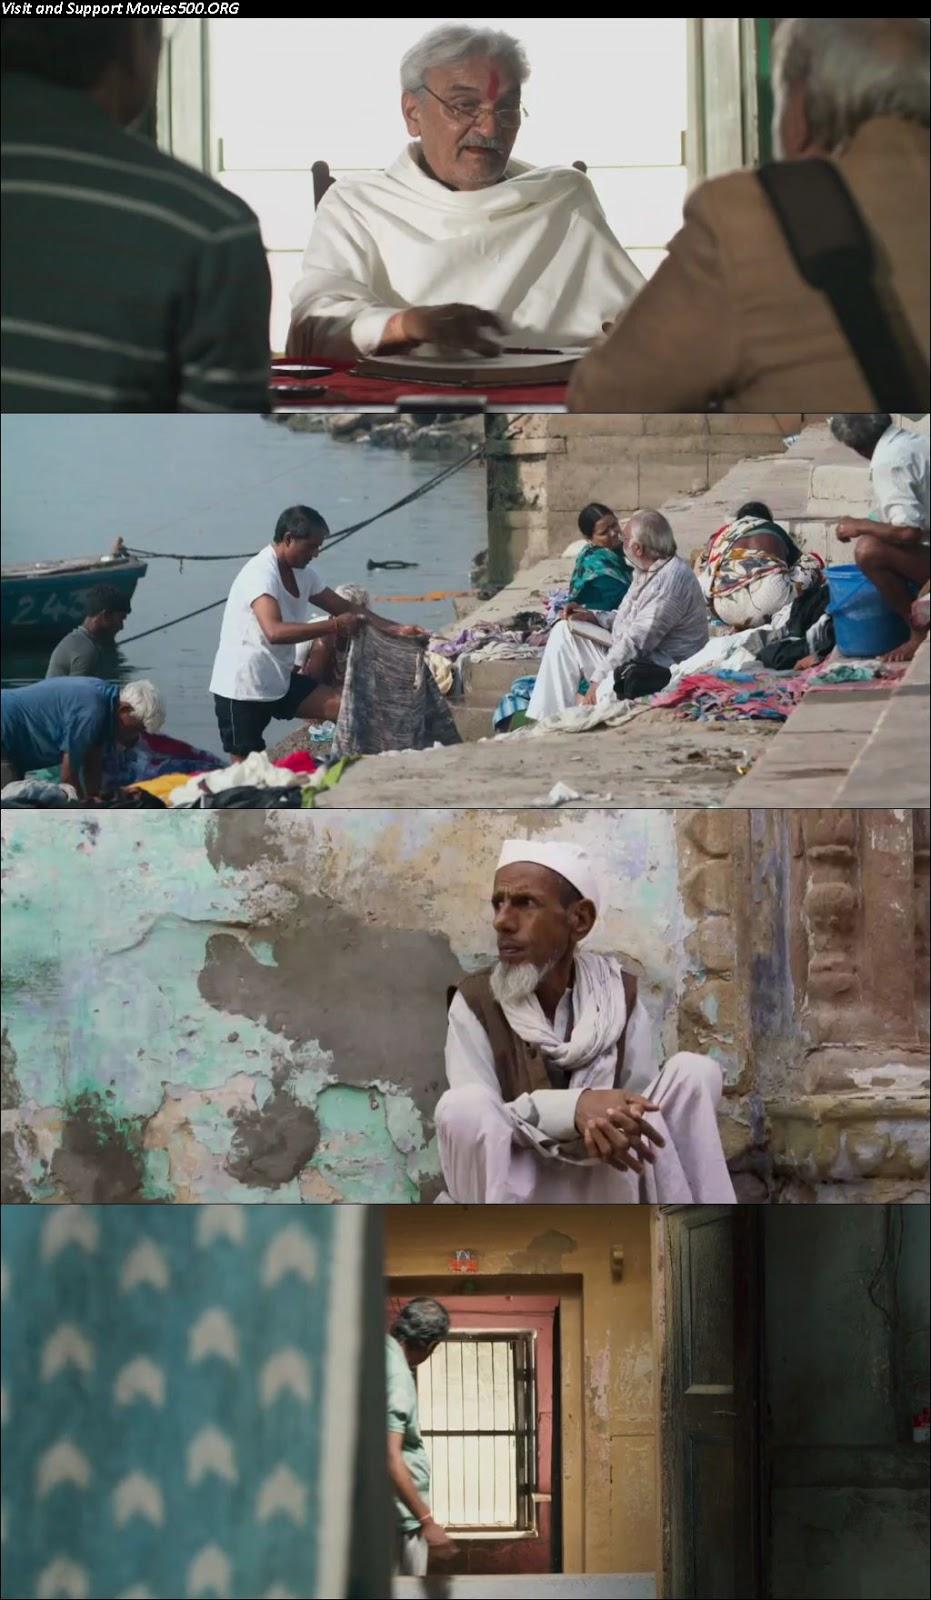 Mukti Bhawan 2017 Hindi Movie Download HDRip 720p at oprbnwjgcljzw.com